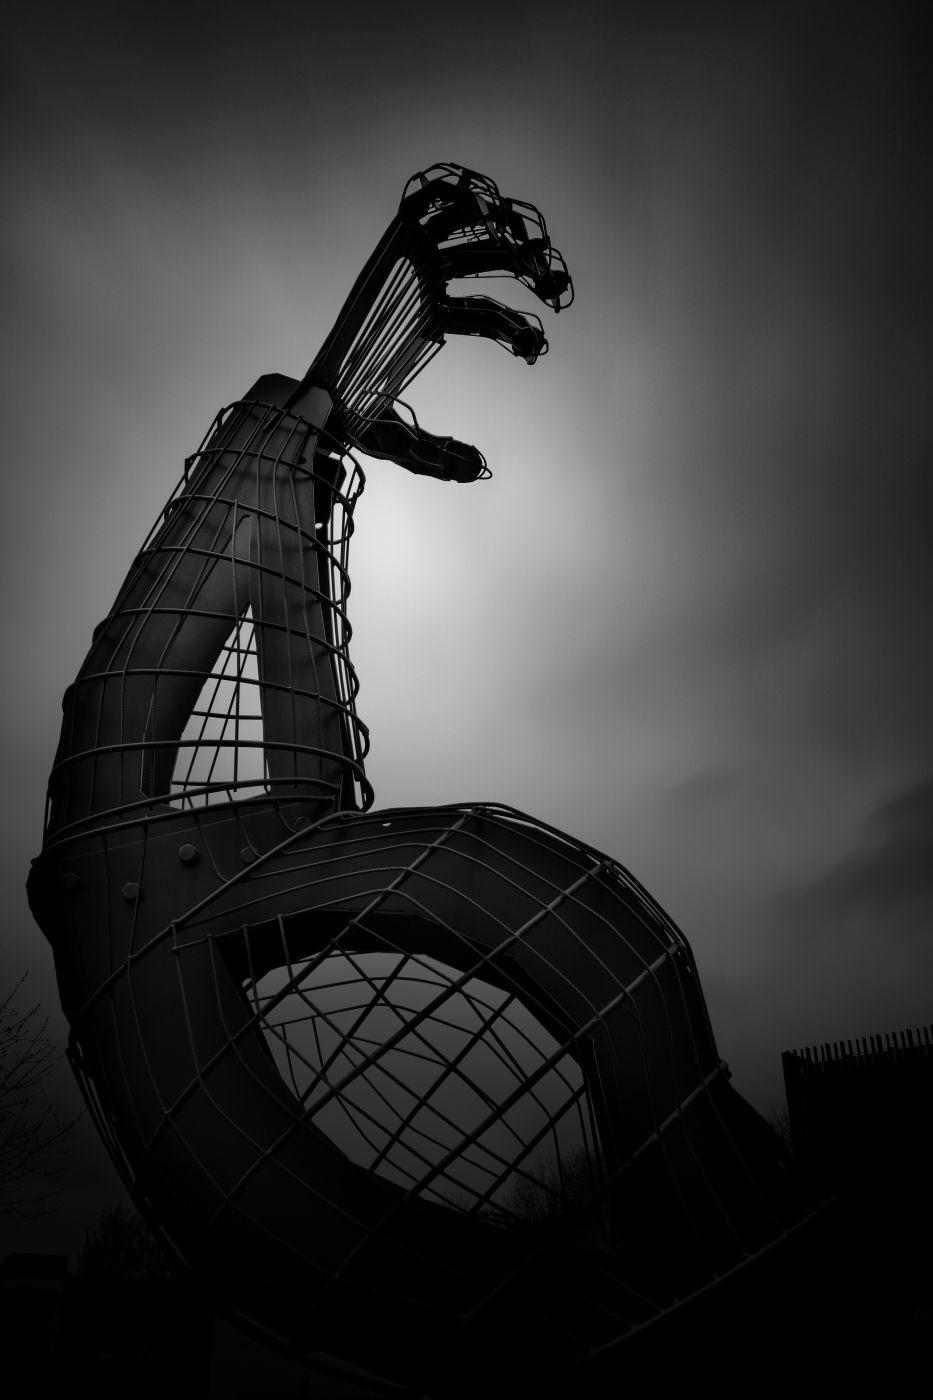 The Arm of John Grün, Luxembourg